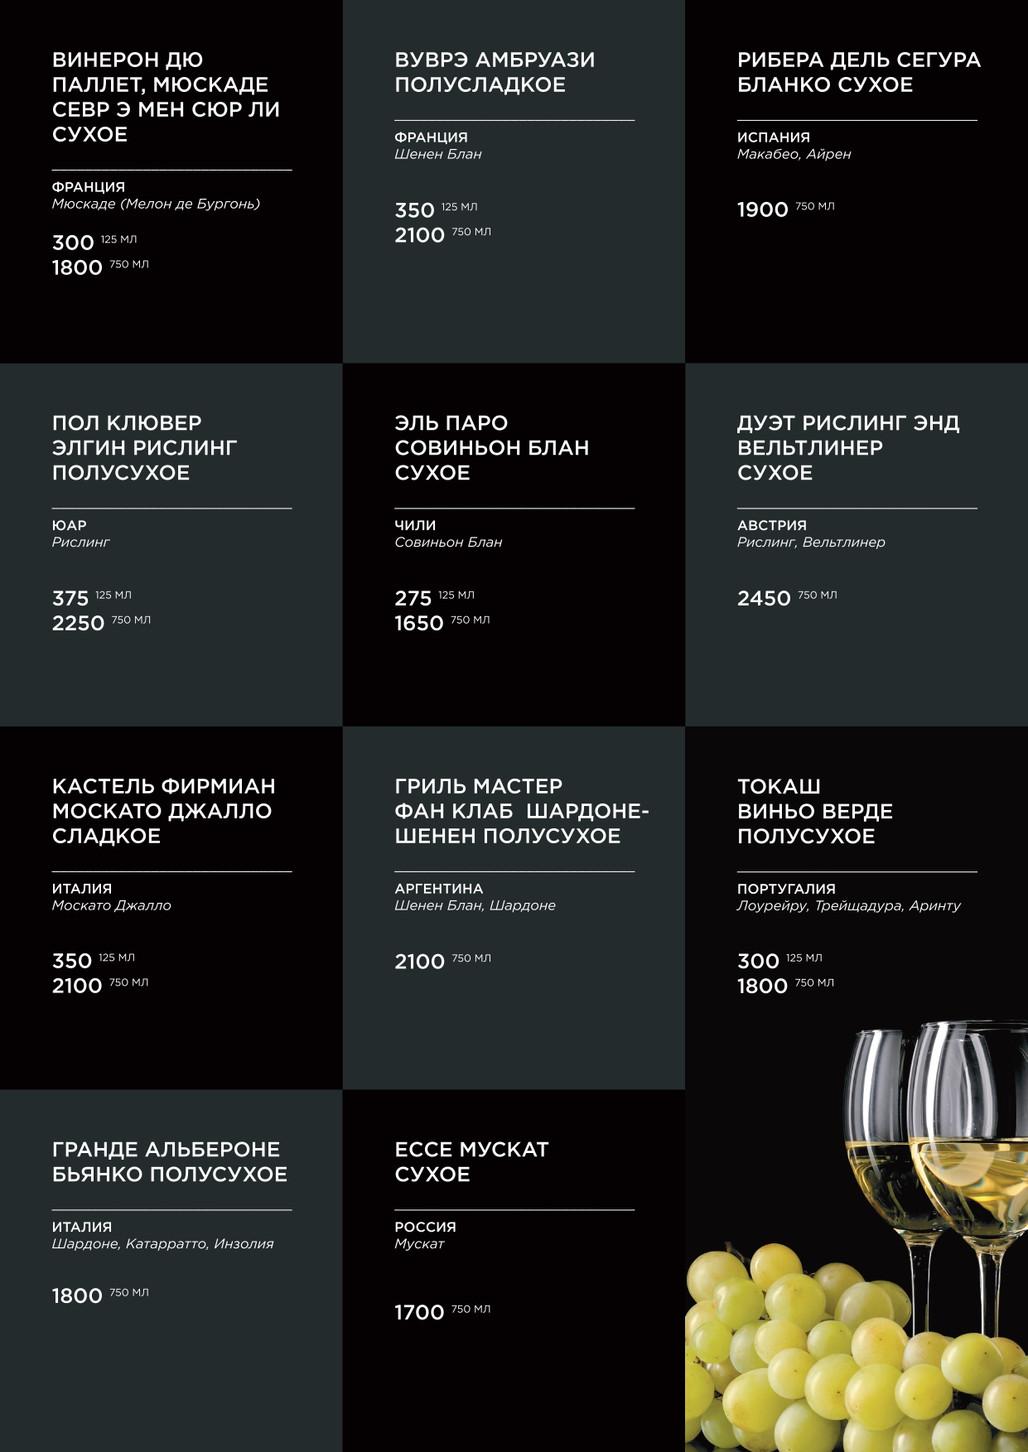 gastroli_wine_menu_print_page-0005.jpg